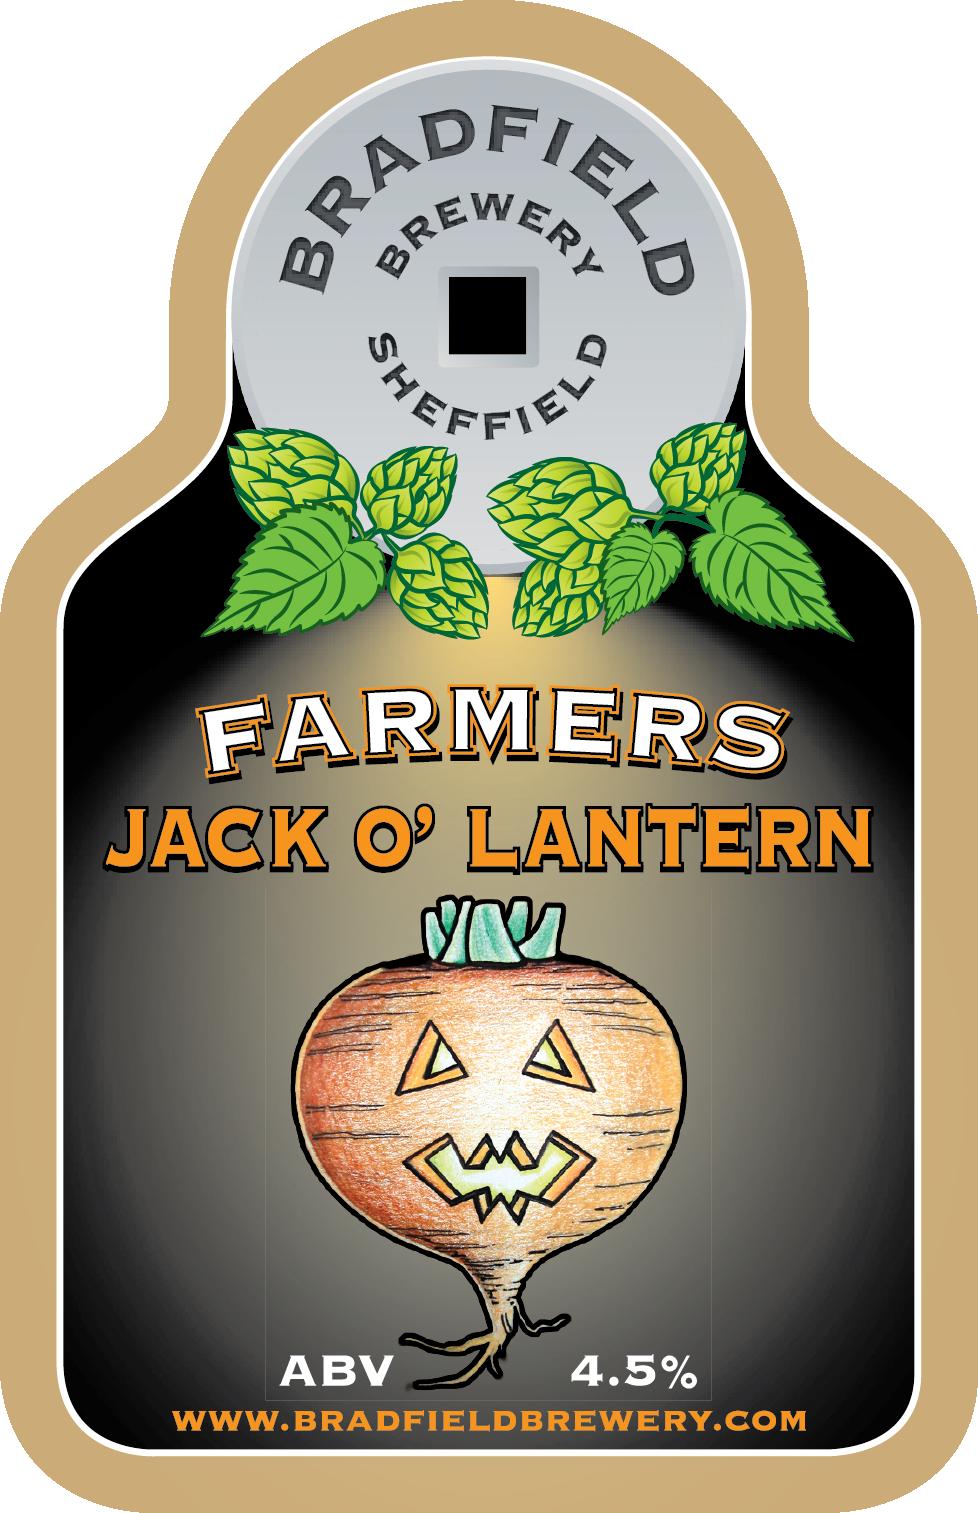 Farmers Jack O'Lantern Ale